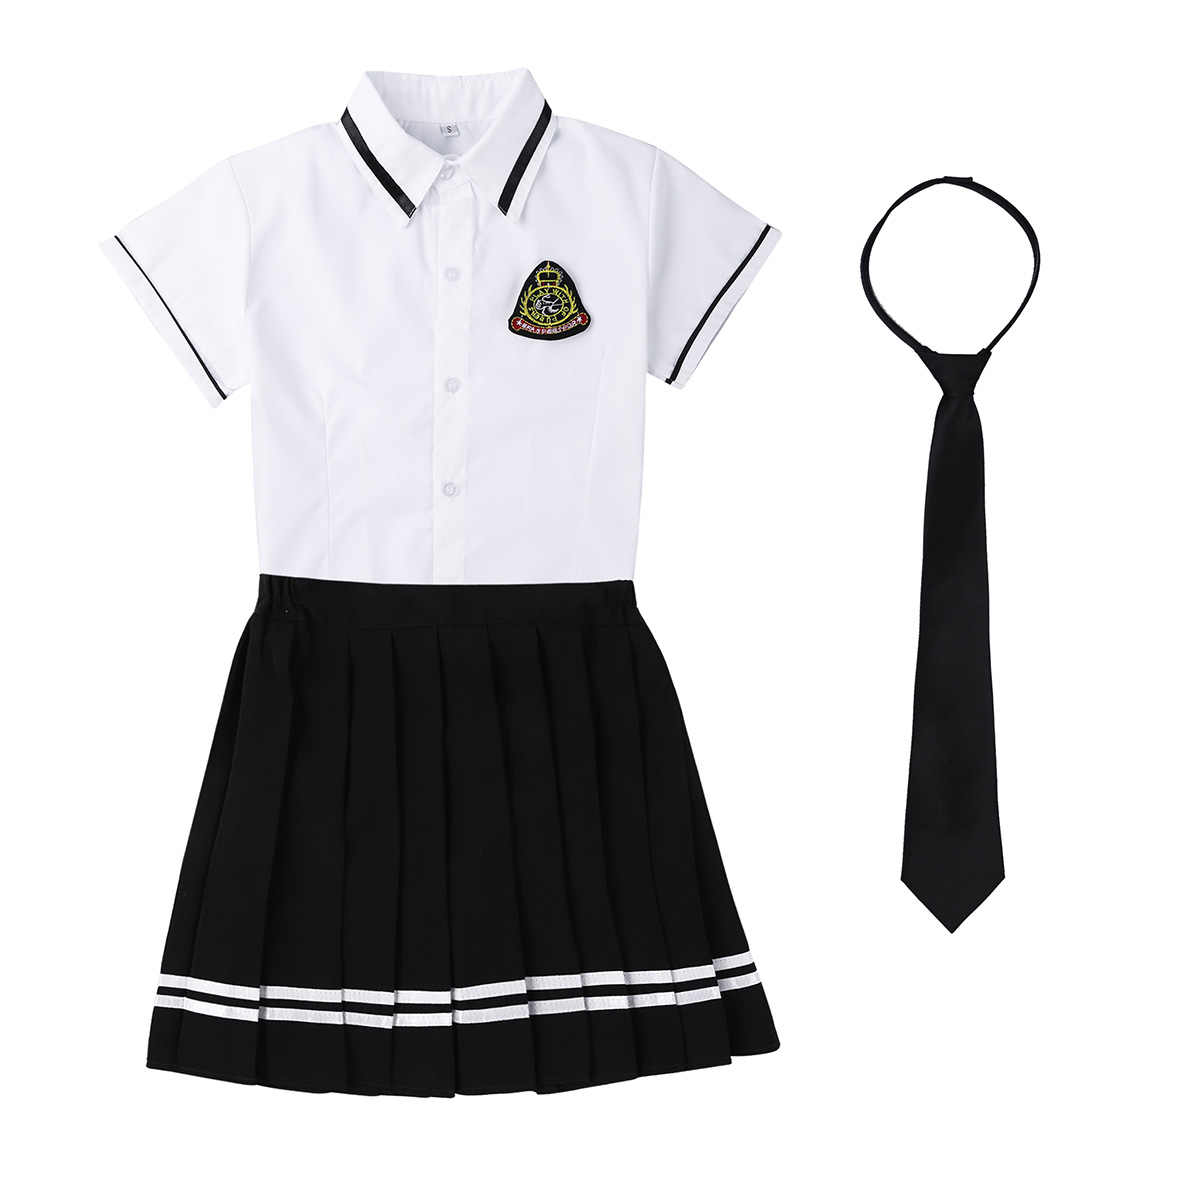 ce25bac30c25 TiaoBug Japanese School Girl Uniform Suit White Short Sleeve T-shirt Top Pleated  Skirt Cosplay .